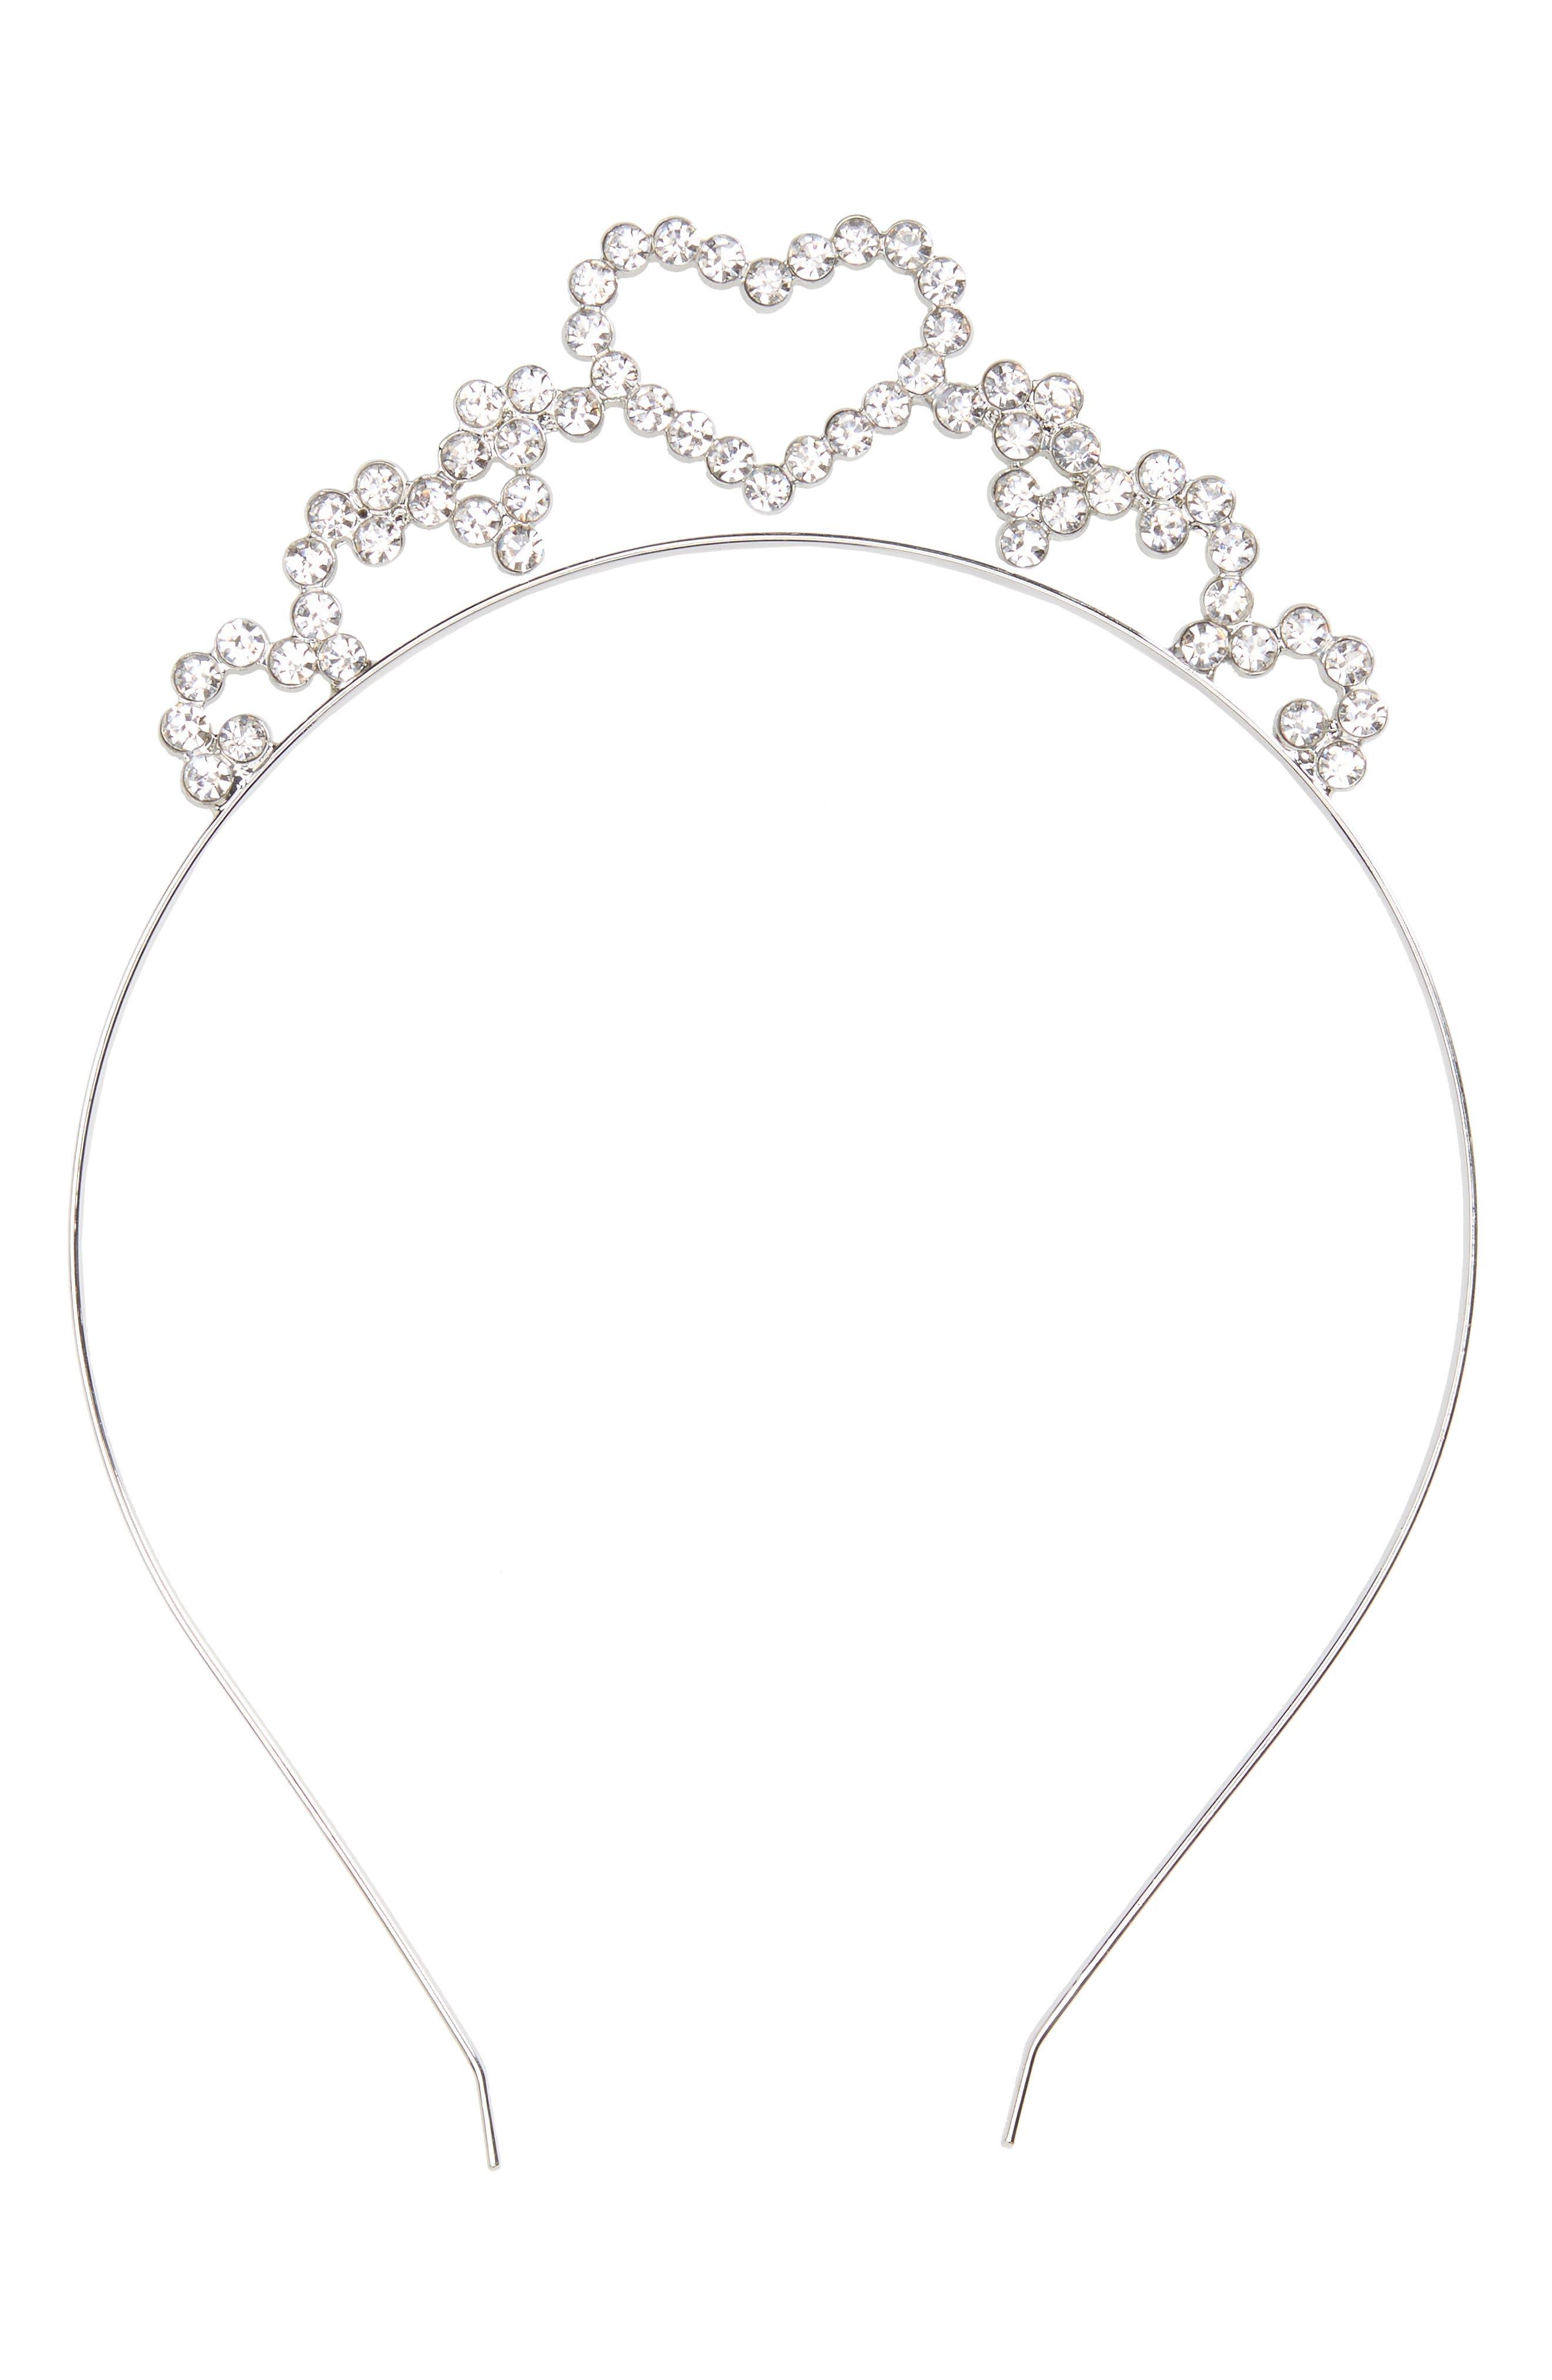 Accessory Collective Crystal Heart Headband,                         Main,                         color, 044